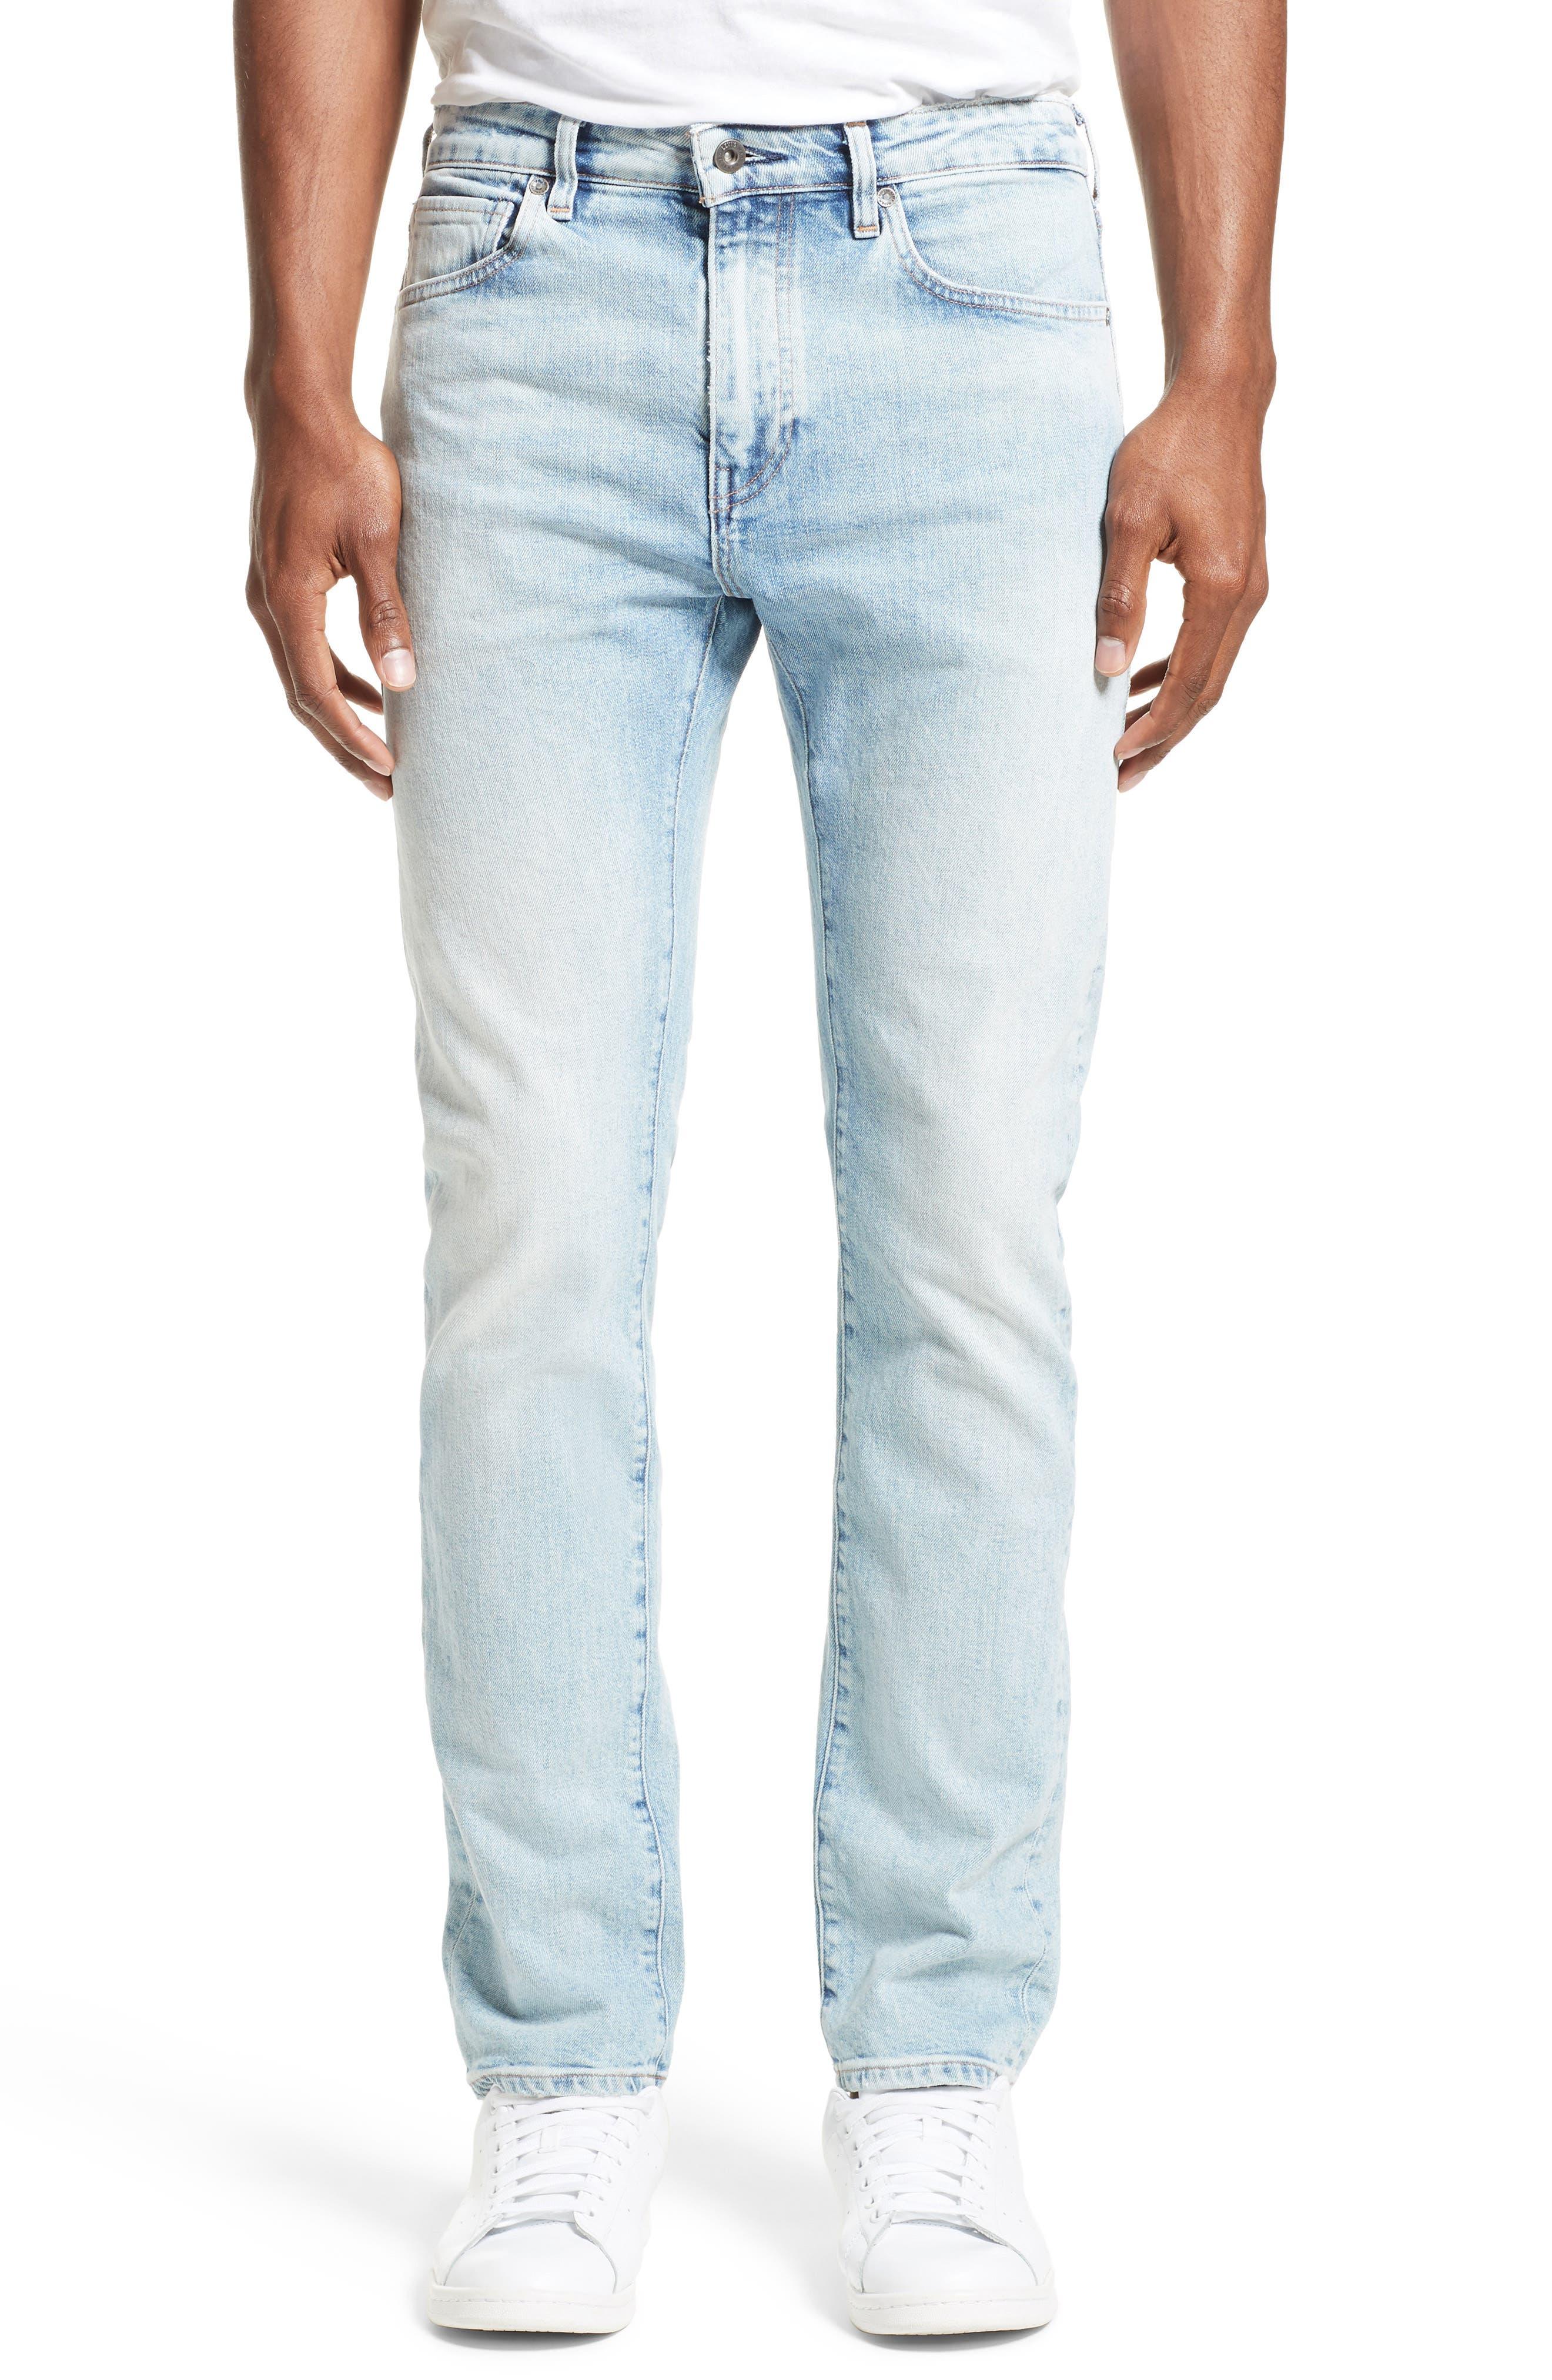 Tack Slim Fit Jeans,                         Main,                         color, 450